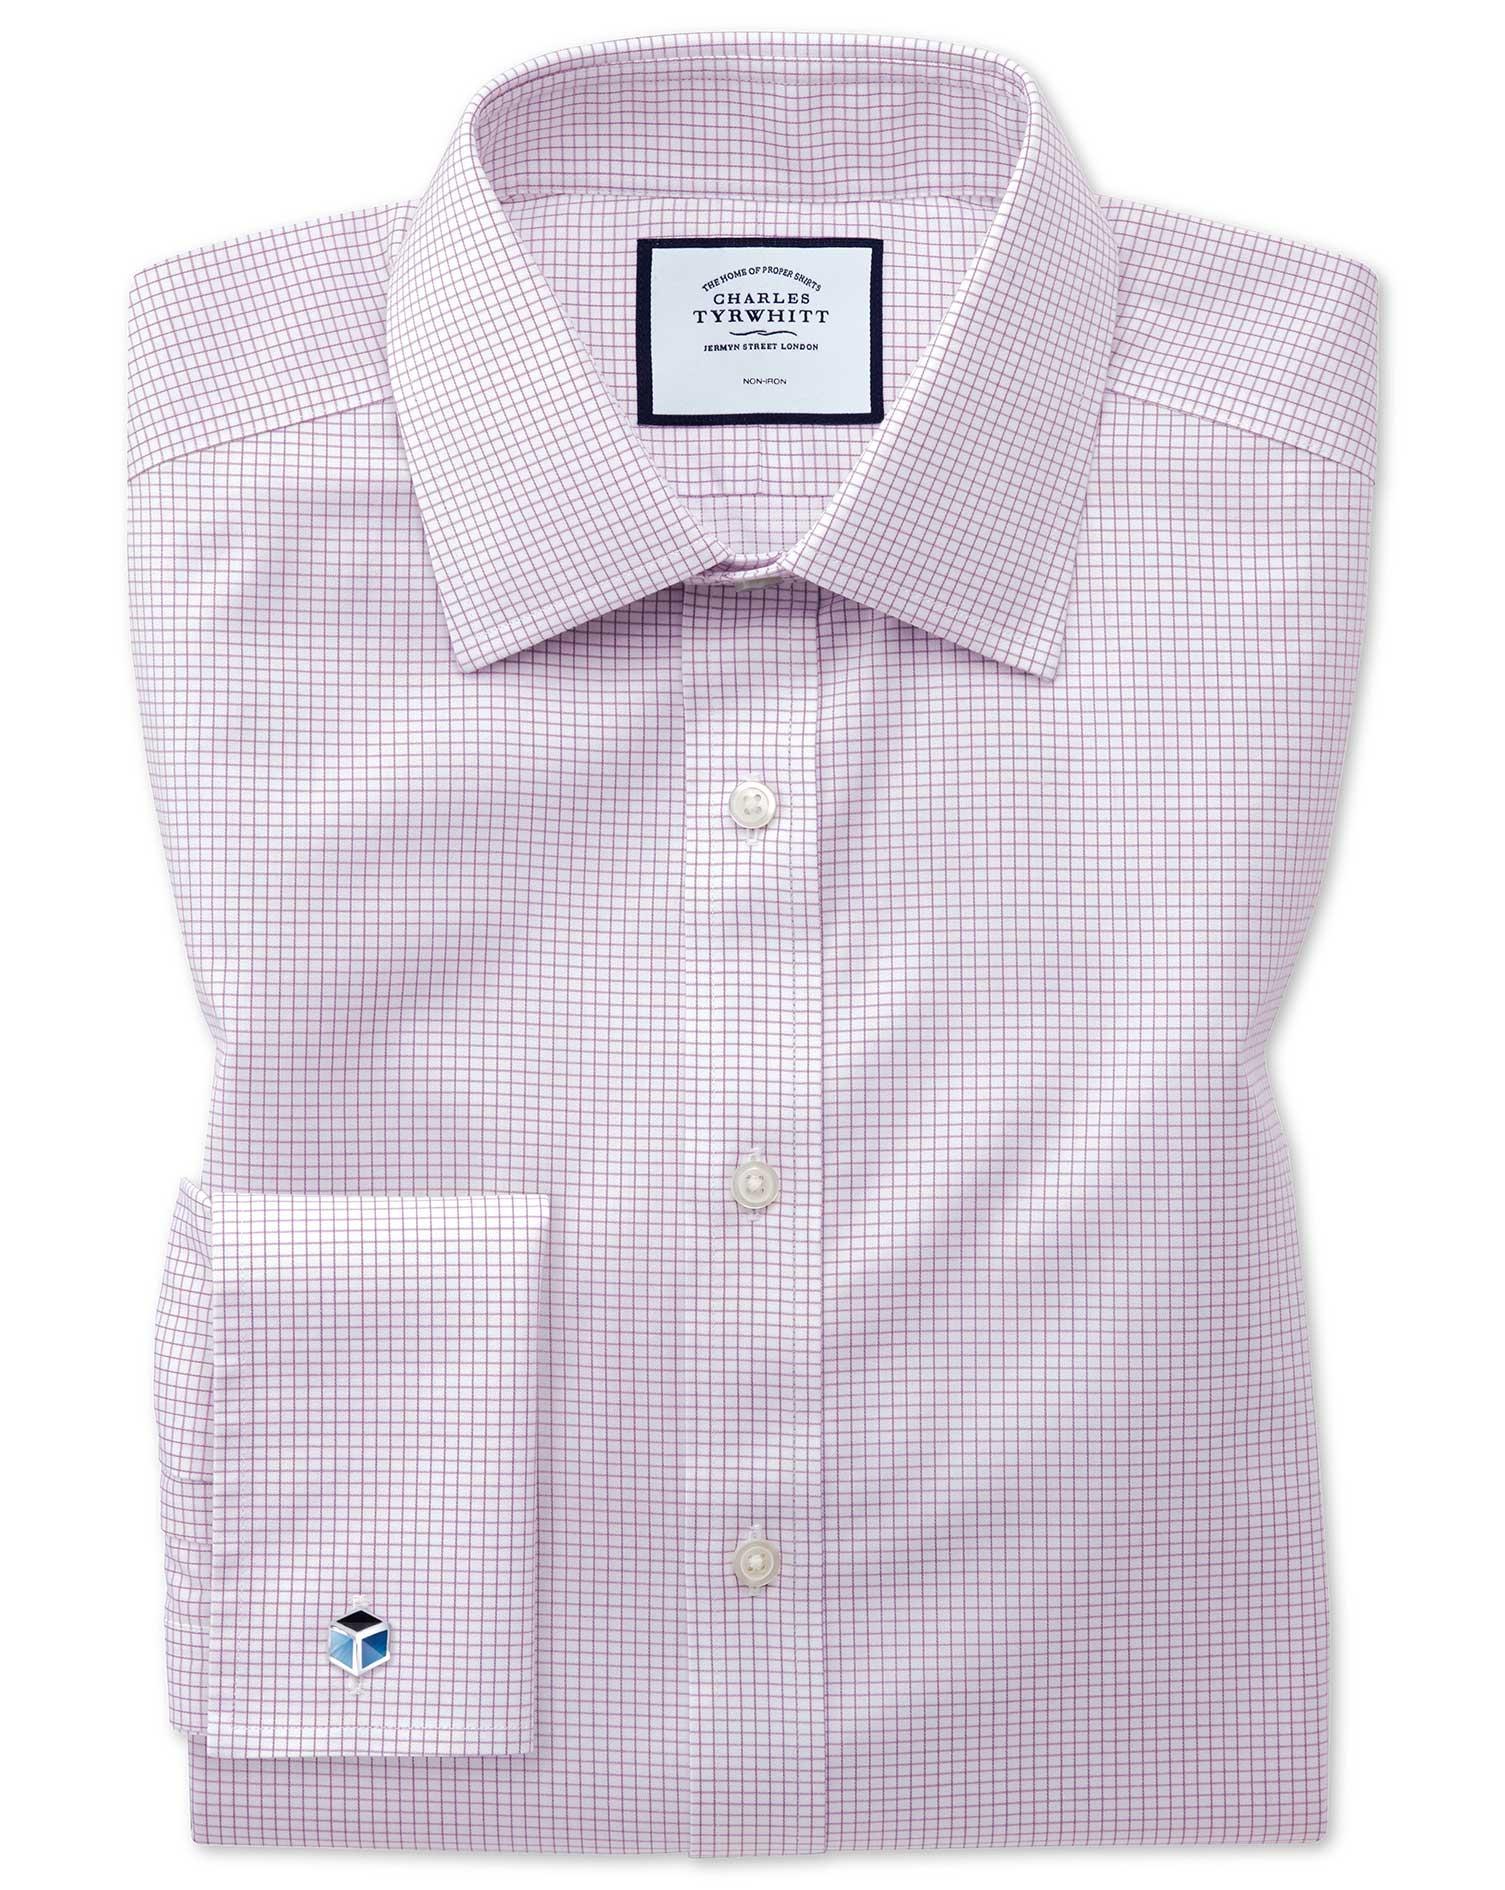 Extra Slim Fit Non-Iron Twill Mini Grid Check Purple Cotton Formal Shirt Single Cuff Size 16/35 by C